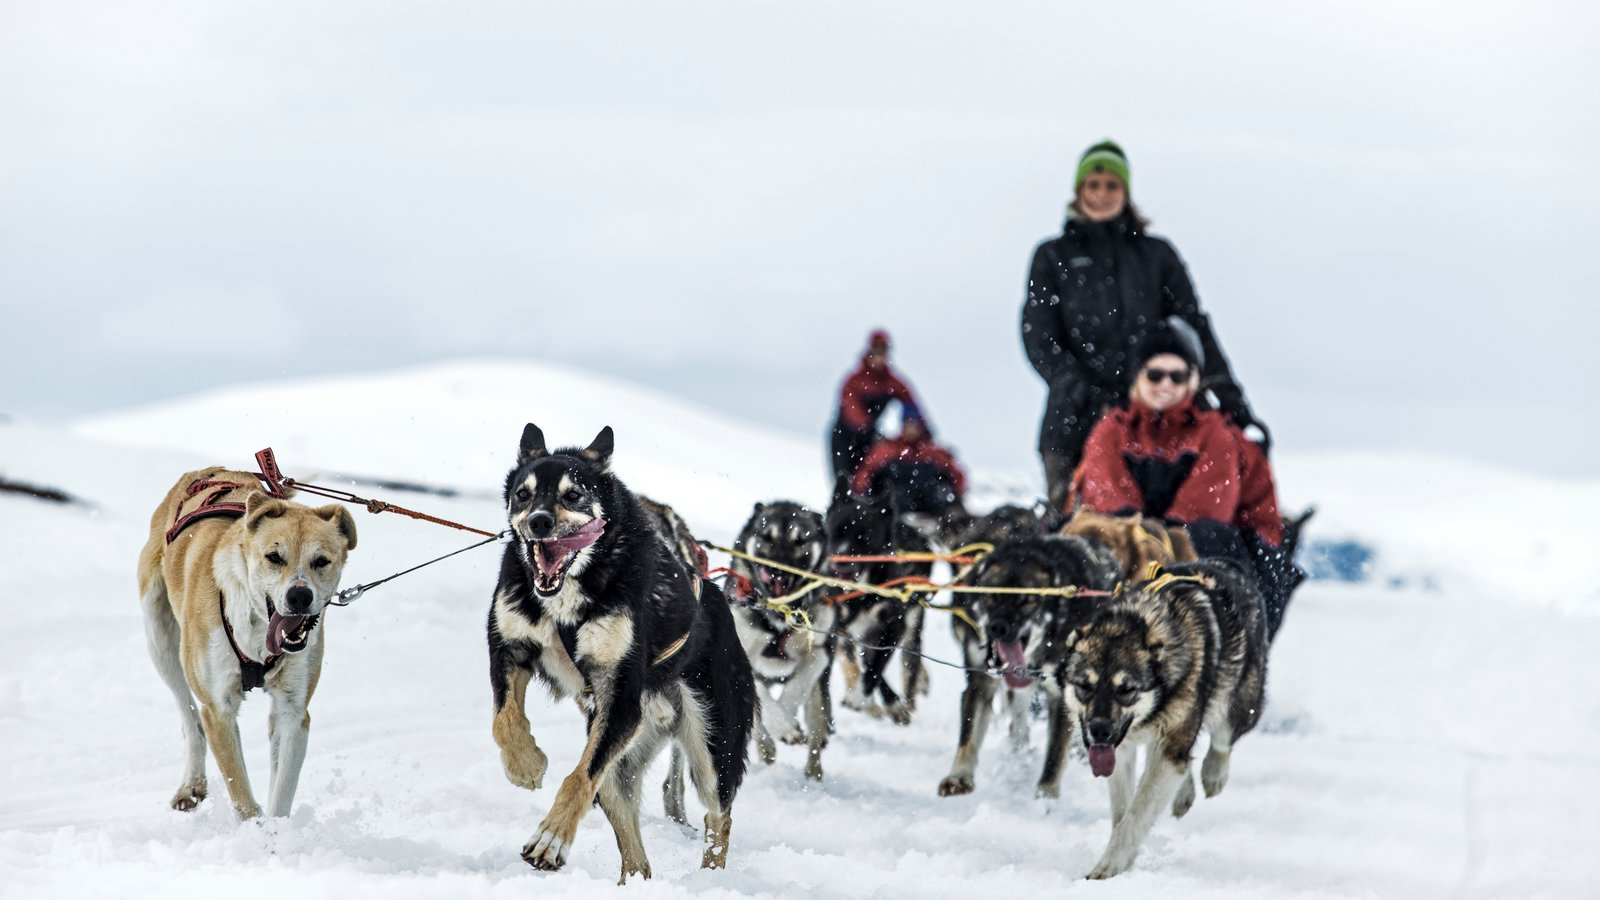 Bjorkliden Fjallby Ski Resort showing snow, dog sledding and cuddly or friendly animals